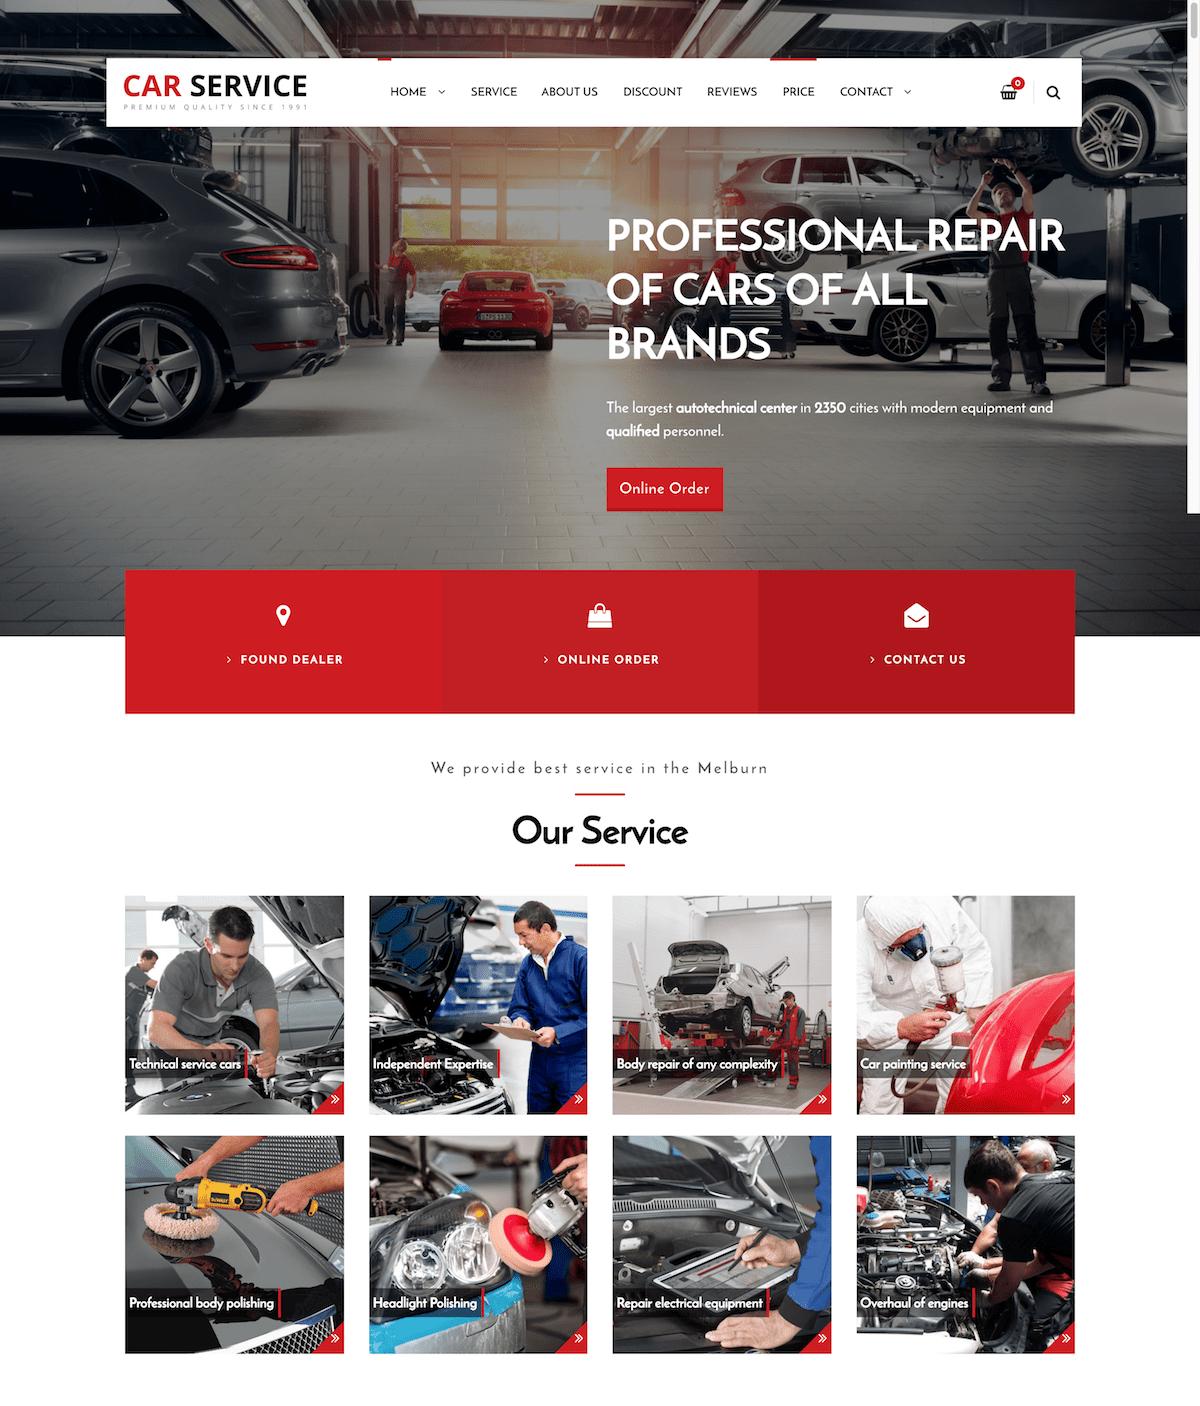 screencapture-max-webs-themforest-html-avados-demo-1519743631640-min Avados - Car Repair HTML Template